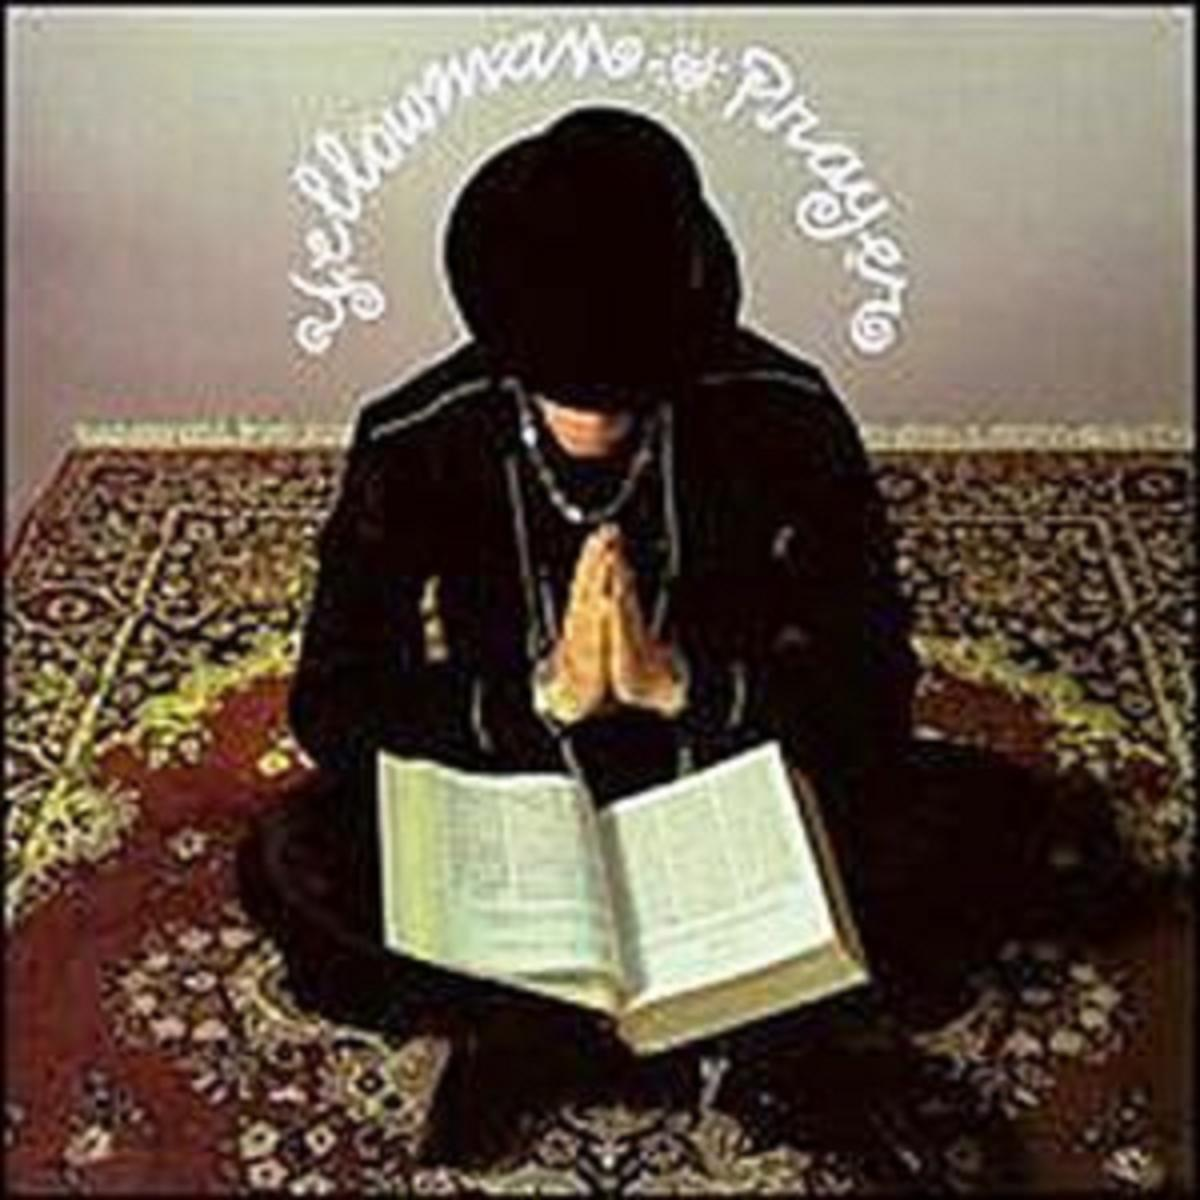 http://3.bp.blogspot.com/_76hc1HkzNCo/S-yTsQnL_GI/AAAAAAAACRY/wdO7kGQo-O4/s1600/Yellowman+Prayer.jpg